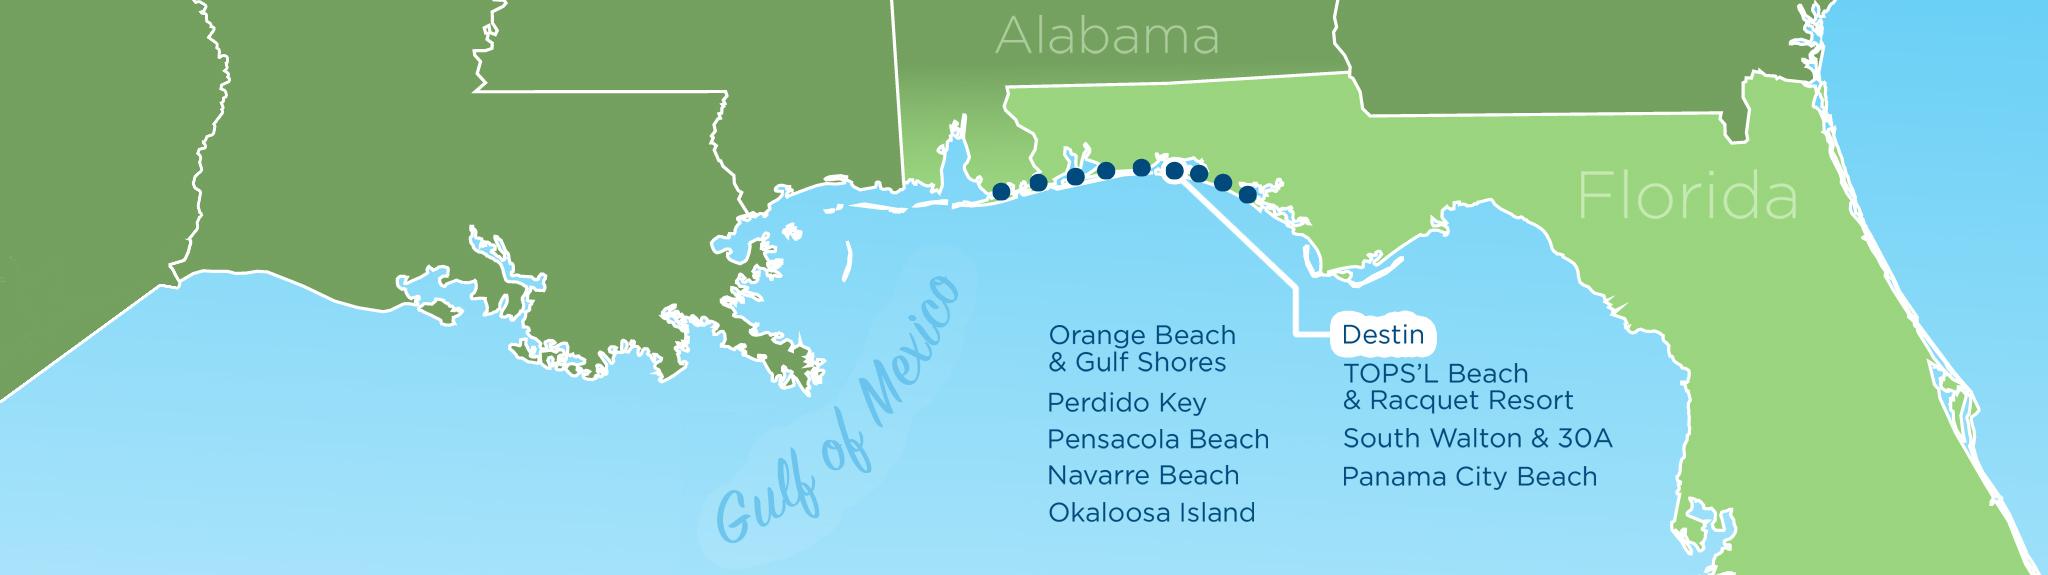 Resortquest Real Estate | Nw Fl & Al Gulf Coast Condos And Homes For - Gulf Shores Florida Map